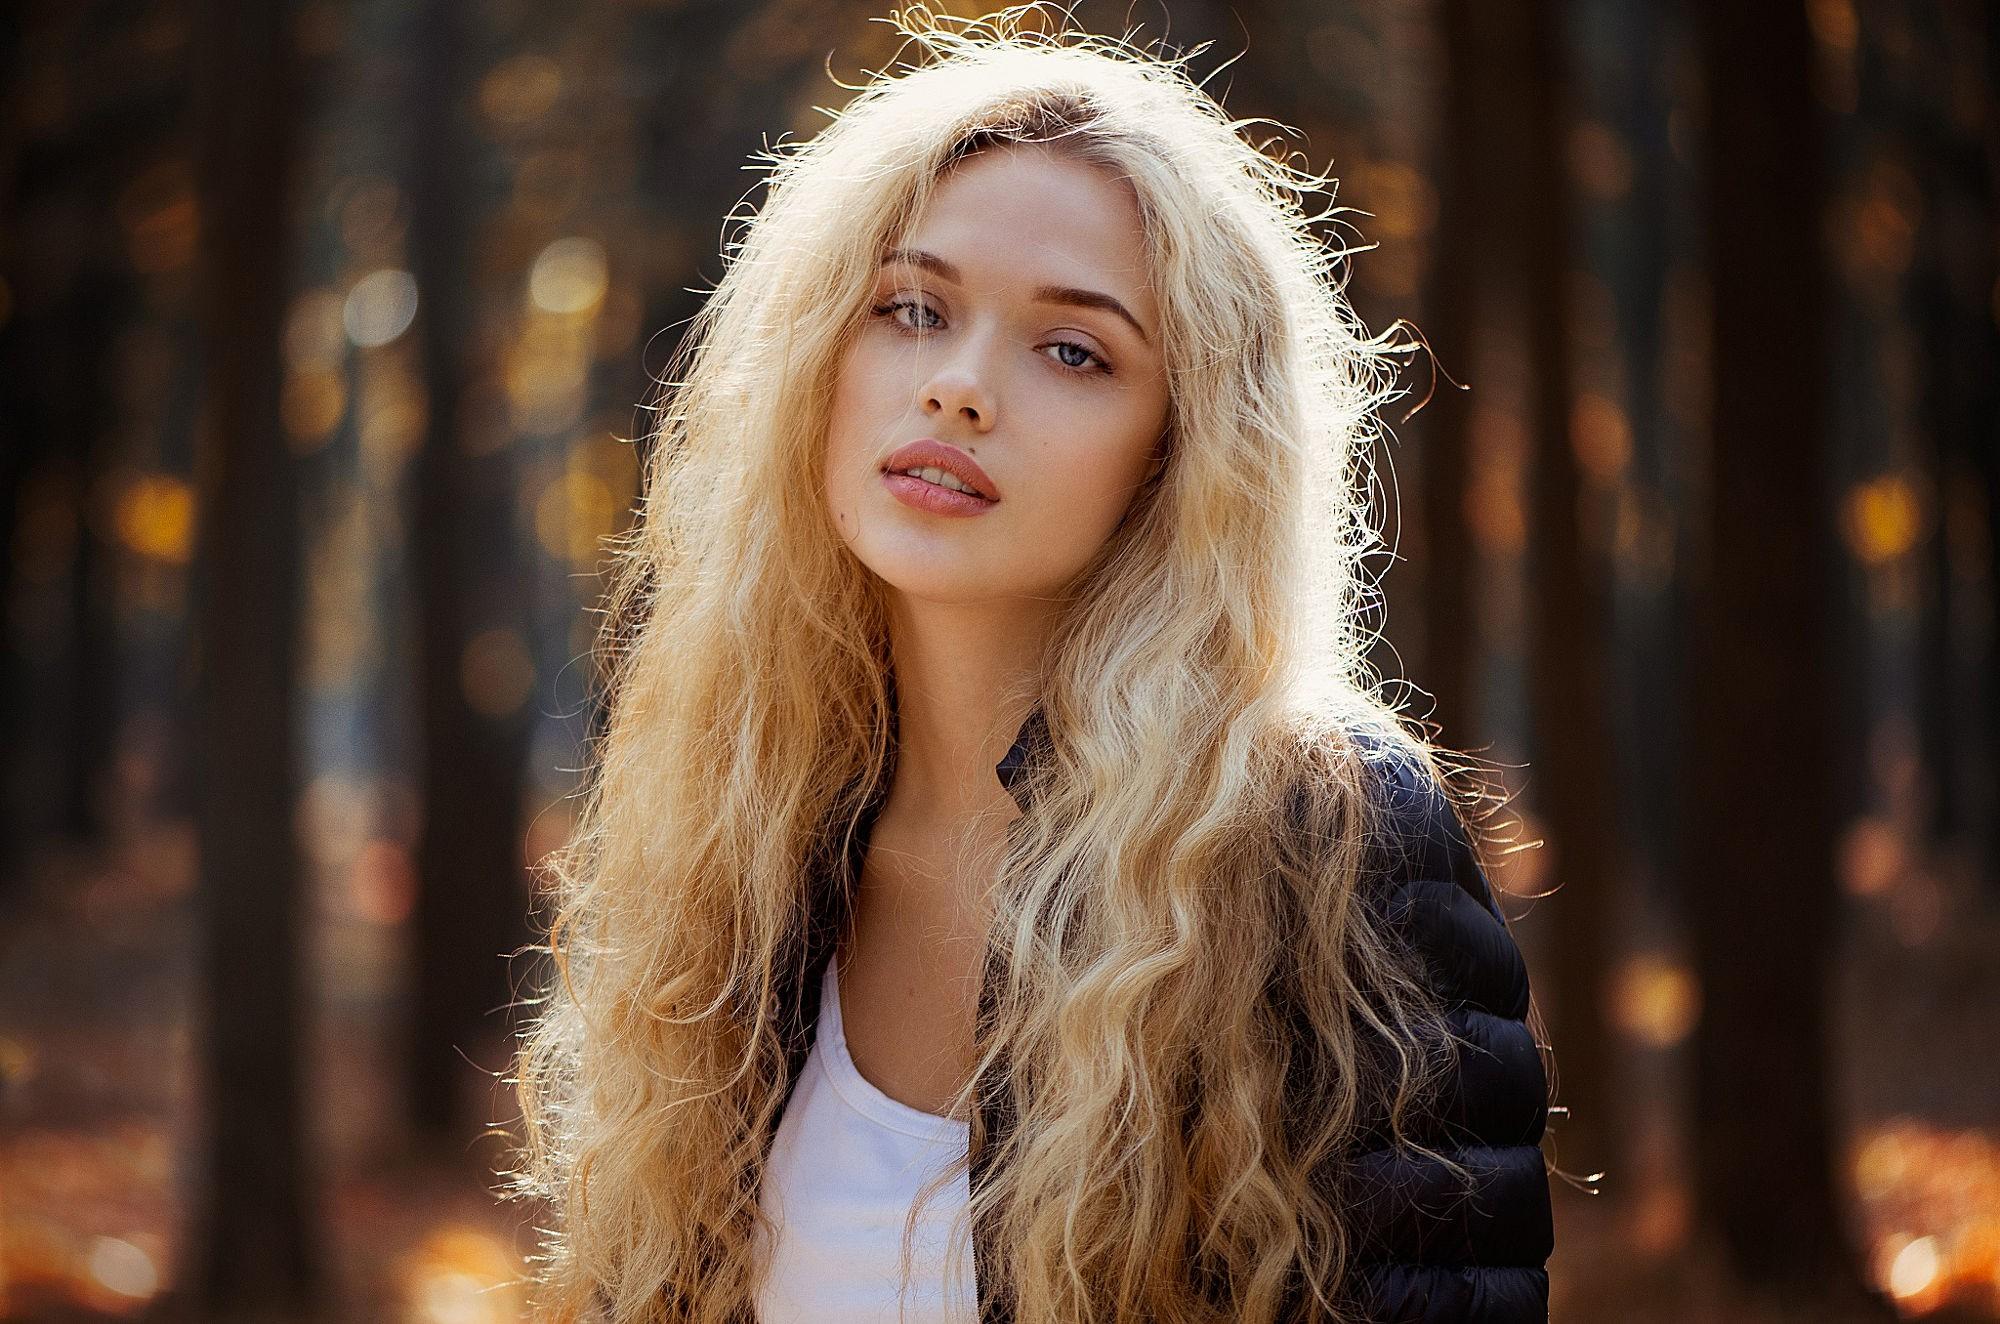 Women Blonde Blue Eyes Long Hair Wavy Hair Portrait: Wallpaper : Women Outdoors, Model, Blonde, Long Hair, Blue